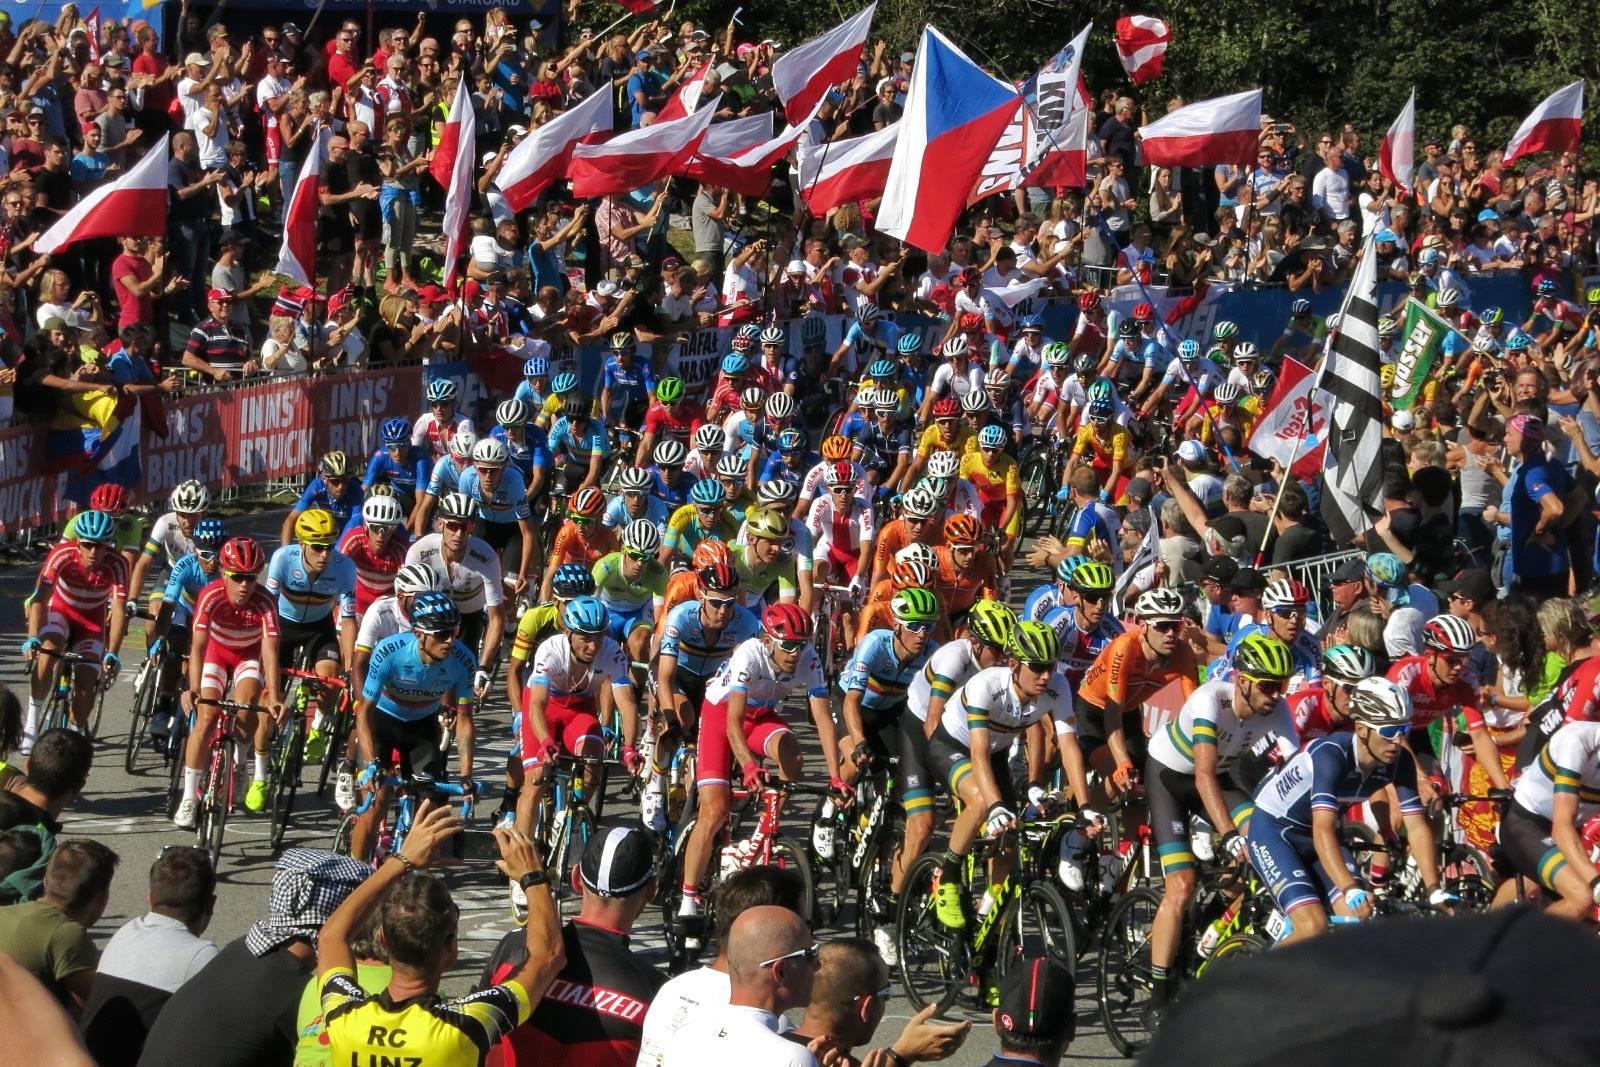 Mundiales de ciclismo JoanSeguidor